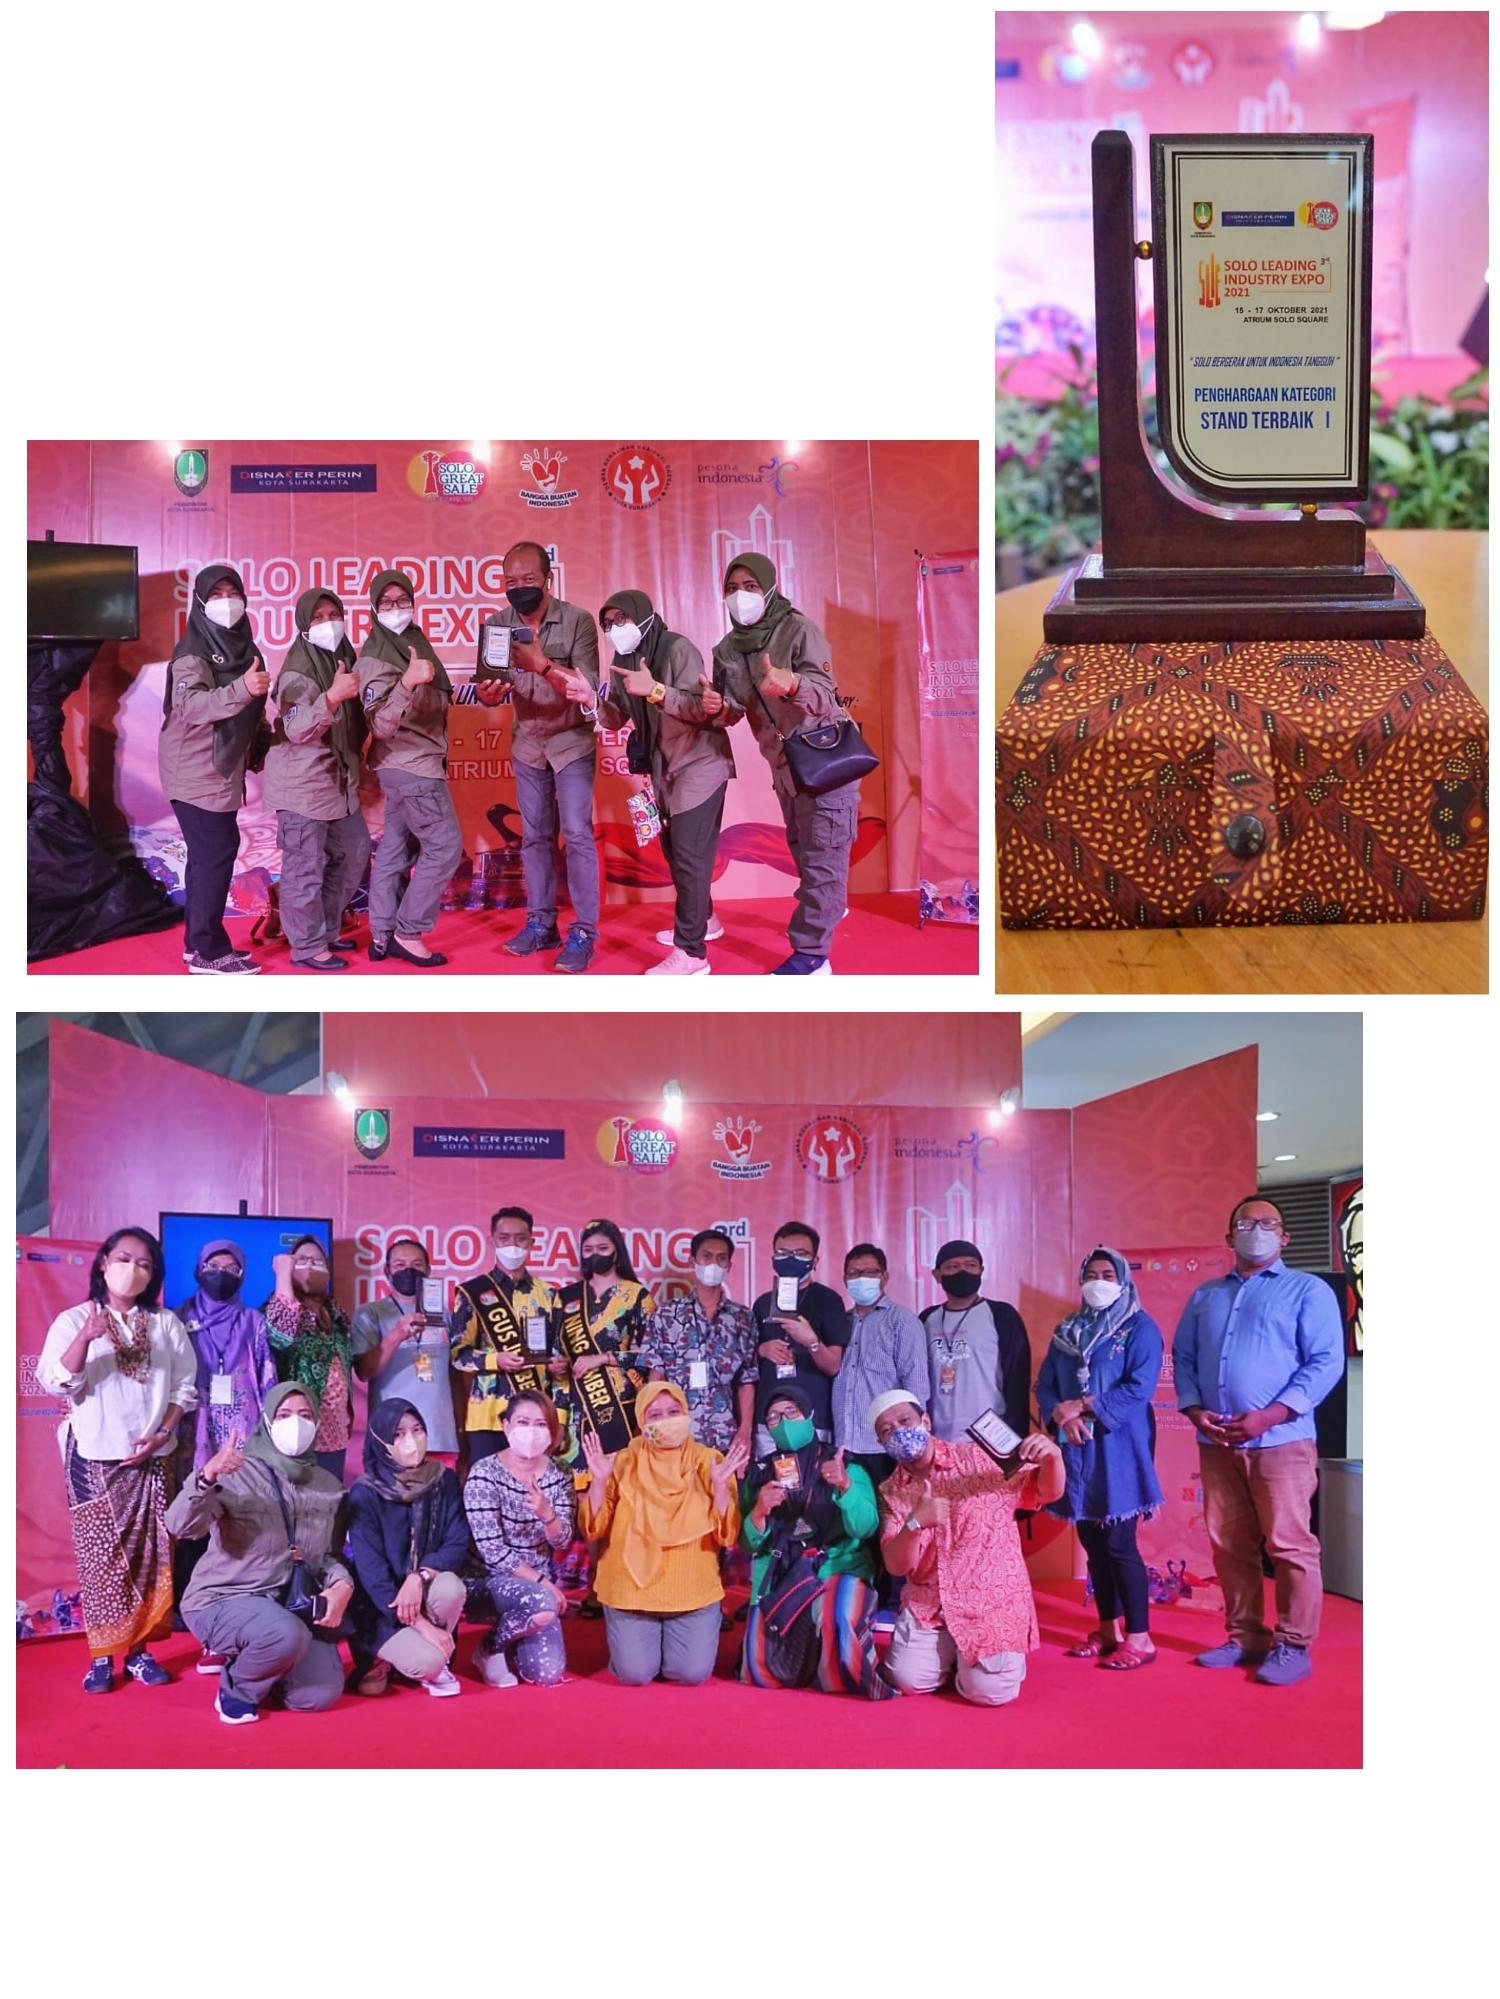 Stand Dinsos Jatim Jadi Stand Terbaik Solo Leading Industry Expo 2021